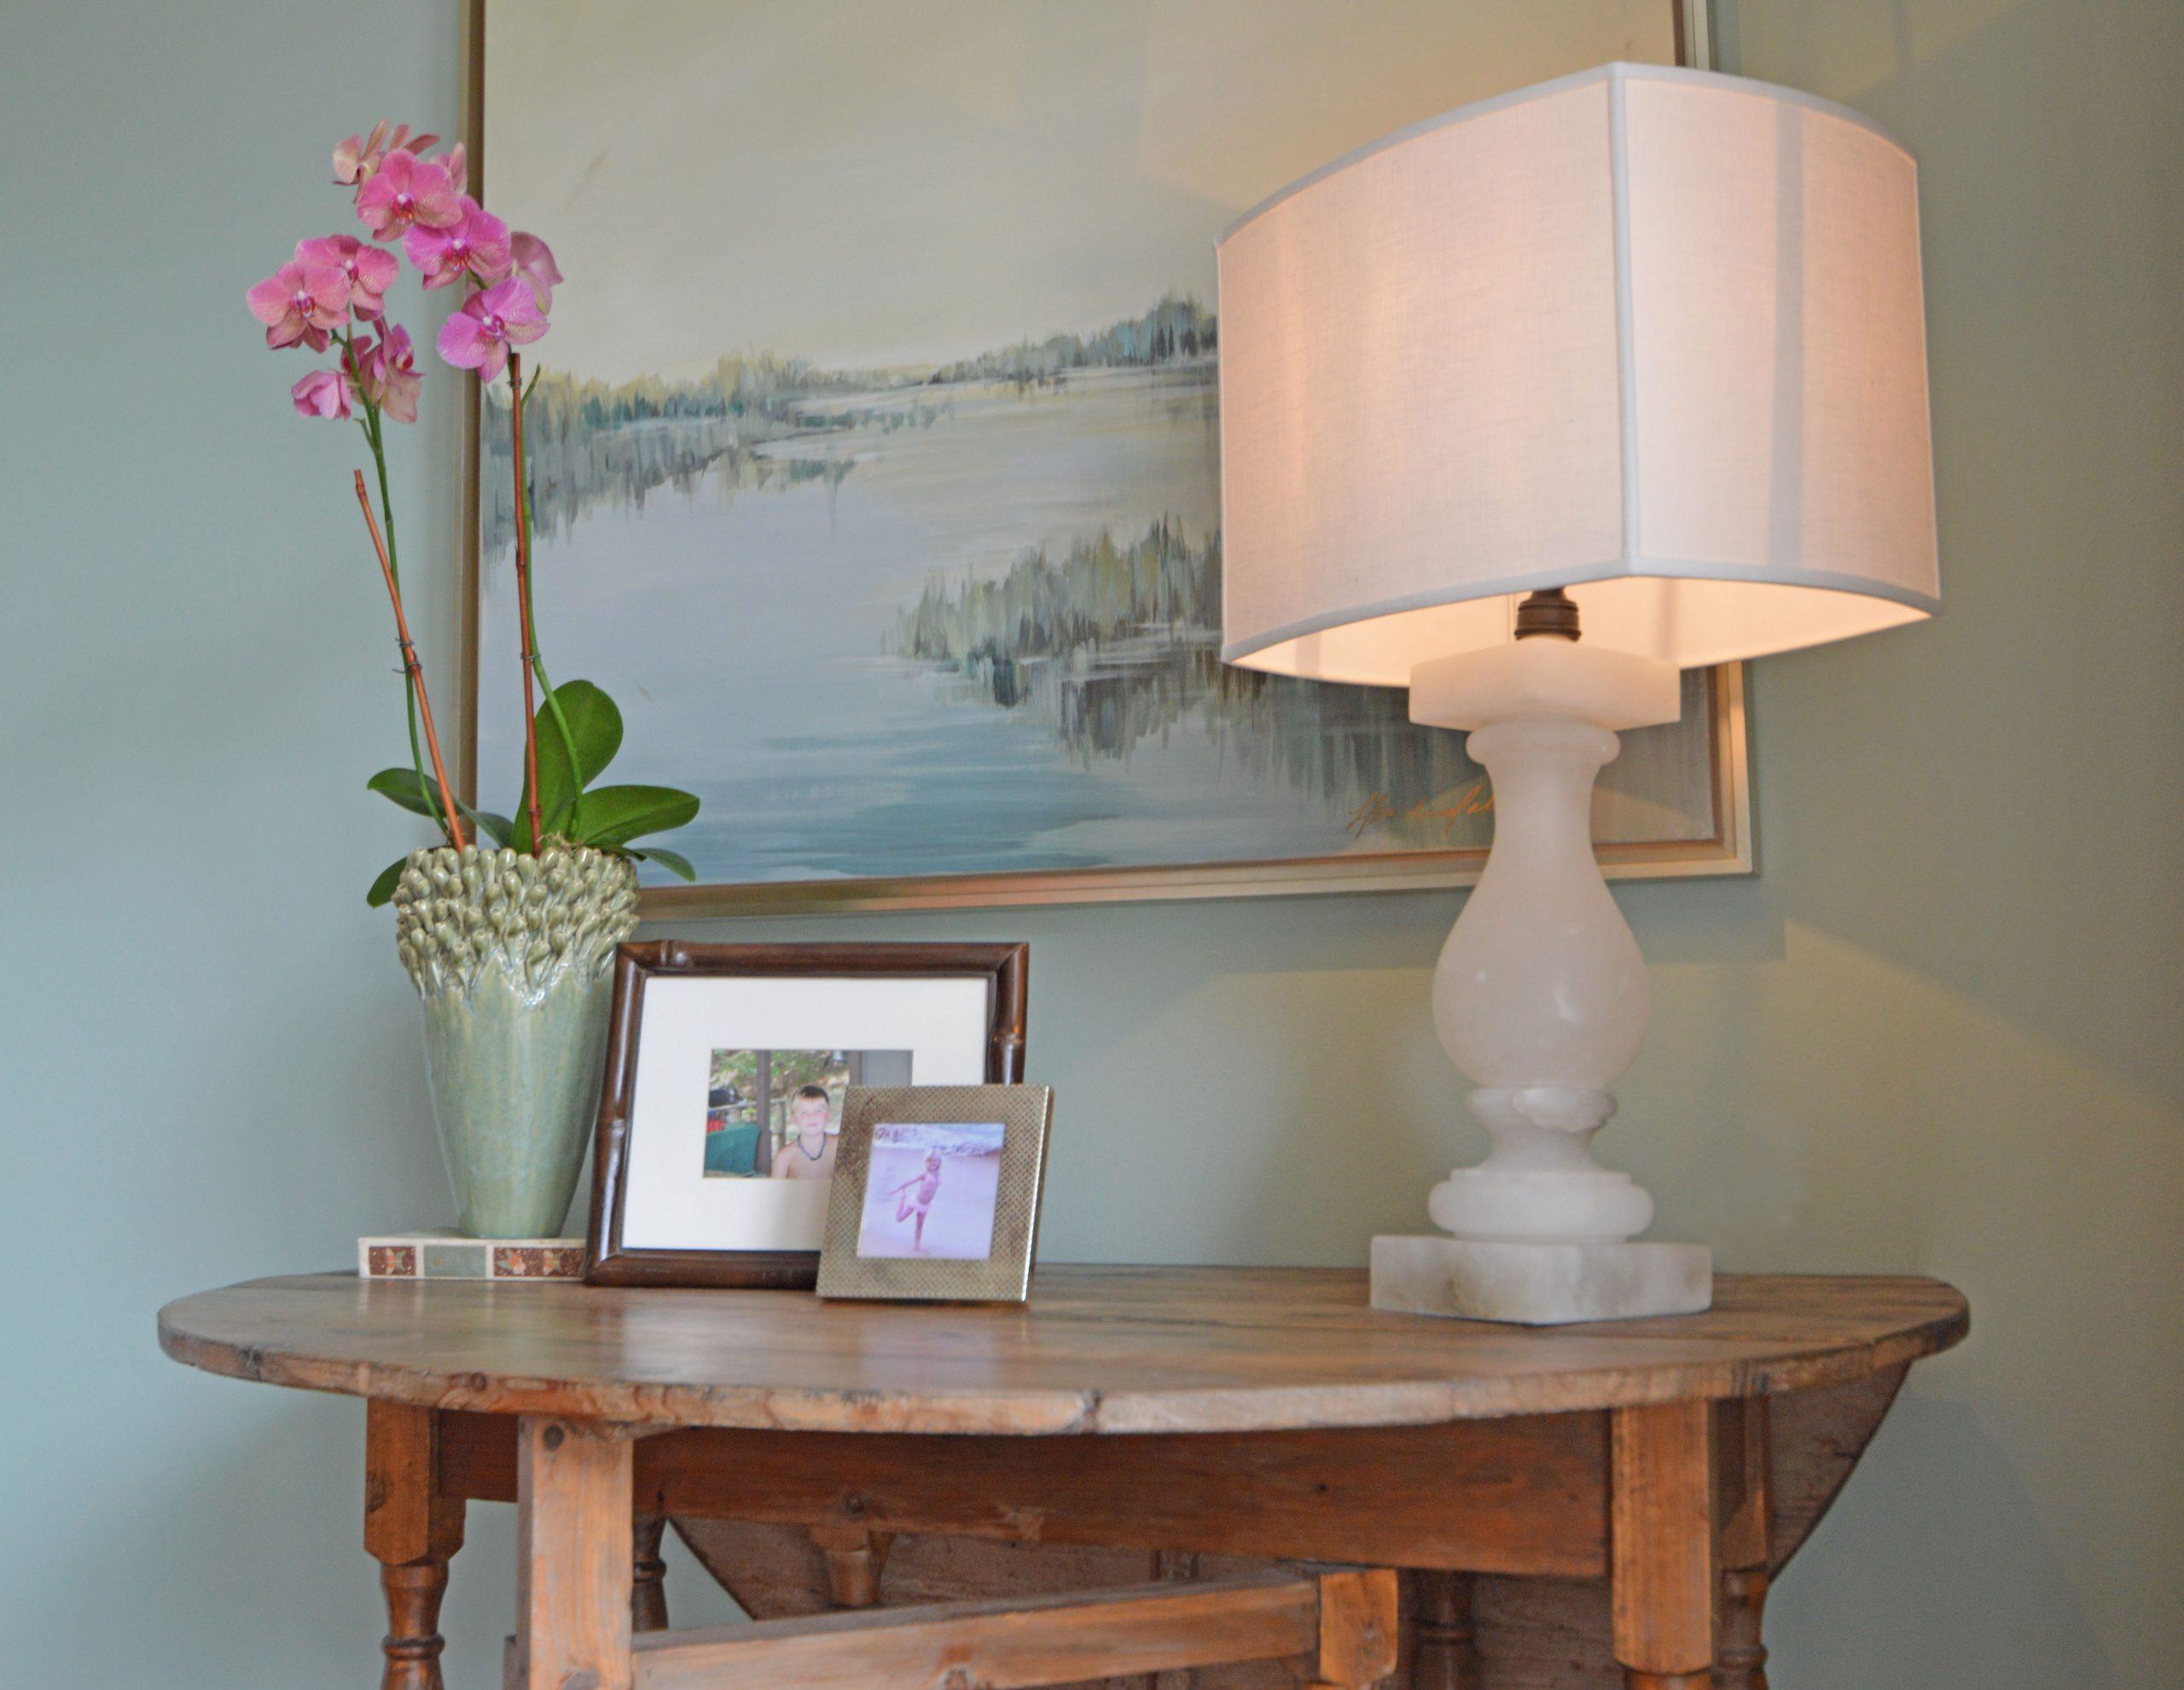 fawley-david2-dixon-smith-interiors-baton-rouge-interior-design-custom-furniture-web-0009